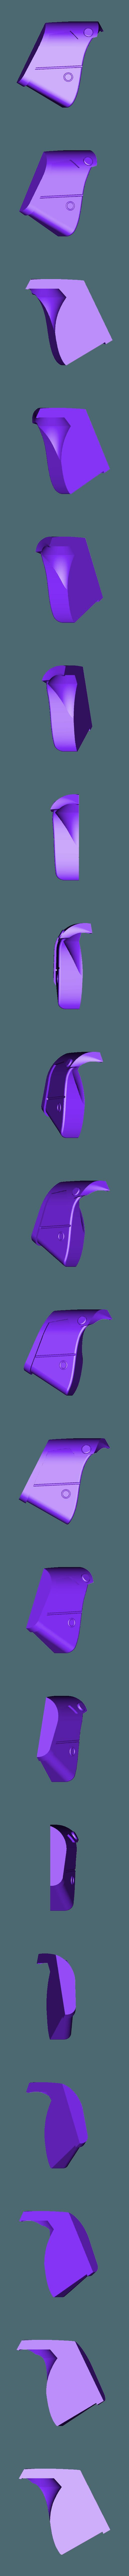 Shoulder_Rest_L.stl Télécharger fichier STL gratuit Borderlands Bandit Room Clener Shotgun • Modèle pour impression 3D, Dsk